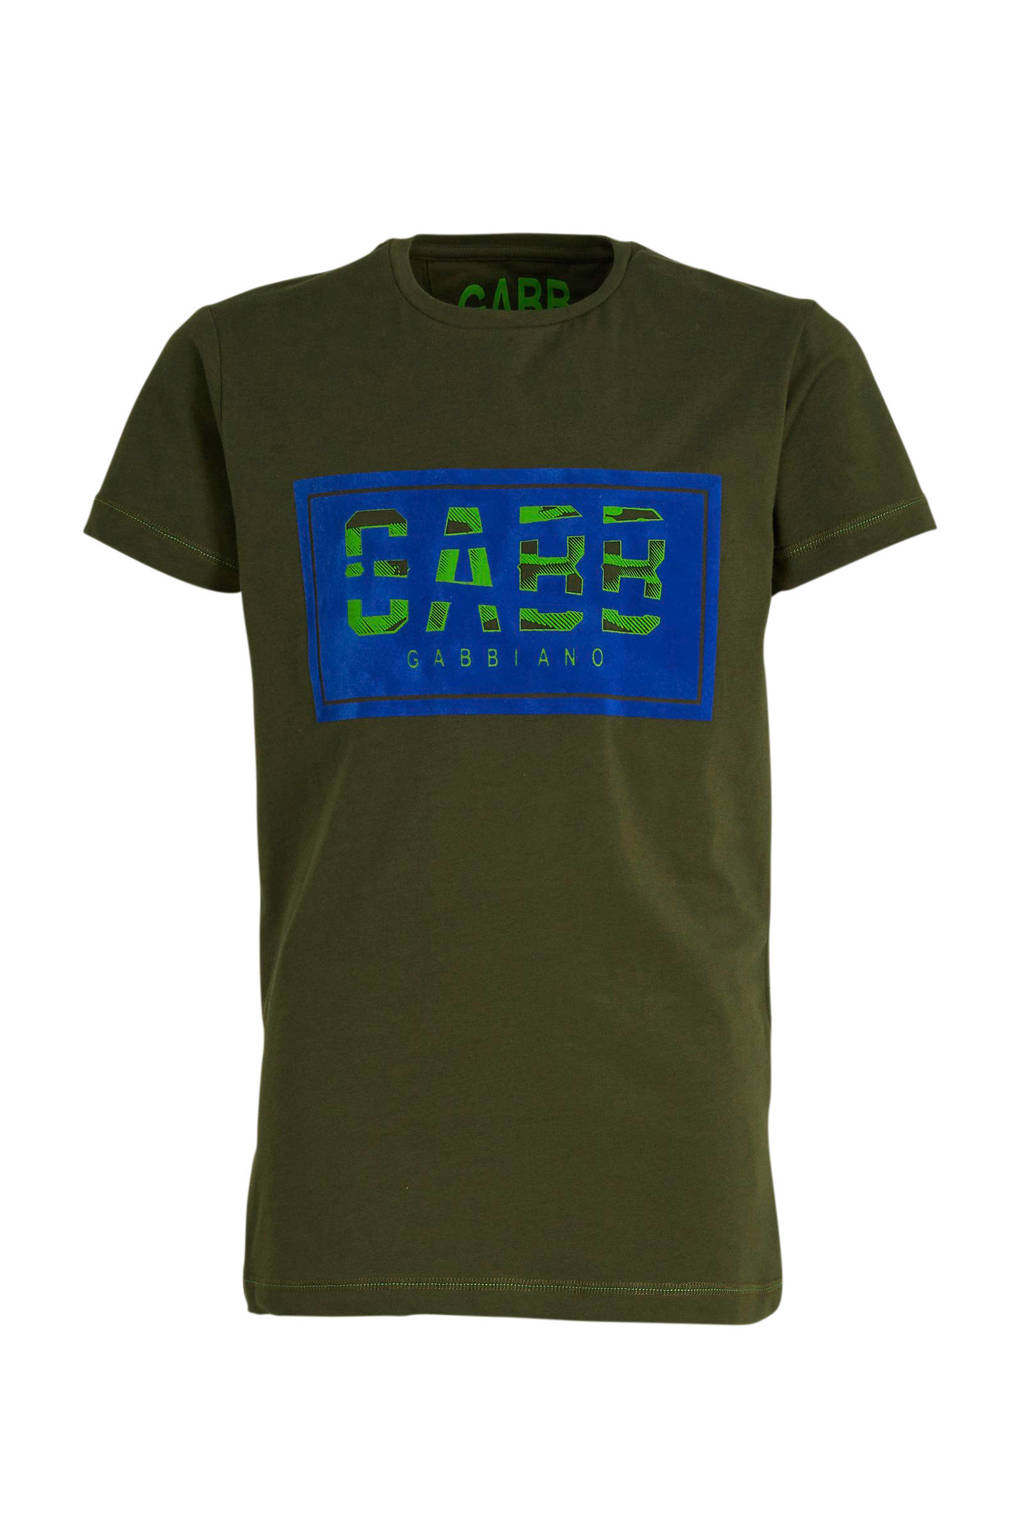 GABBIANO T-shirt met logo donkergroen/groen, Donkergroen/groen